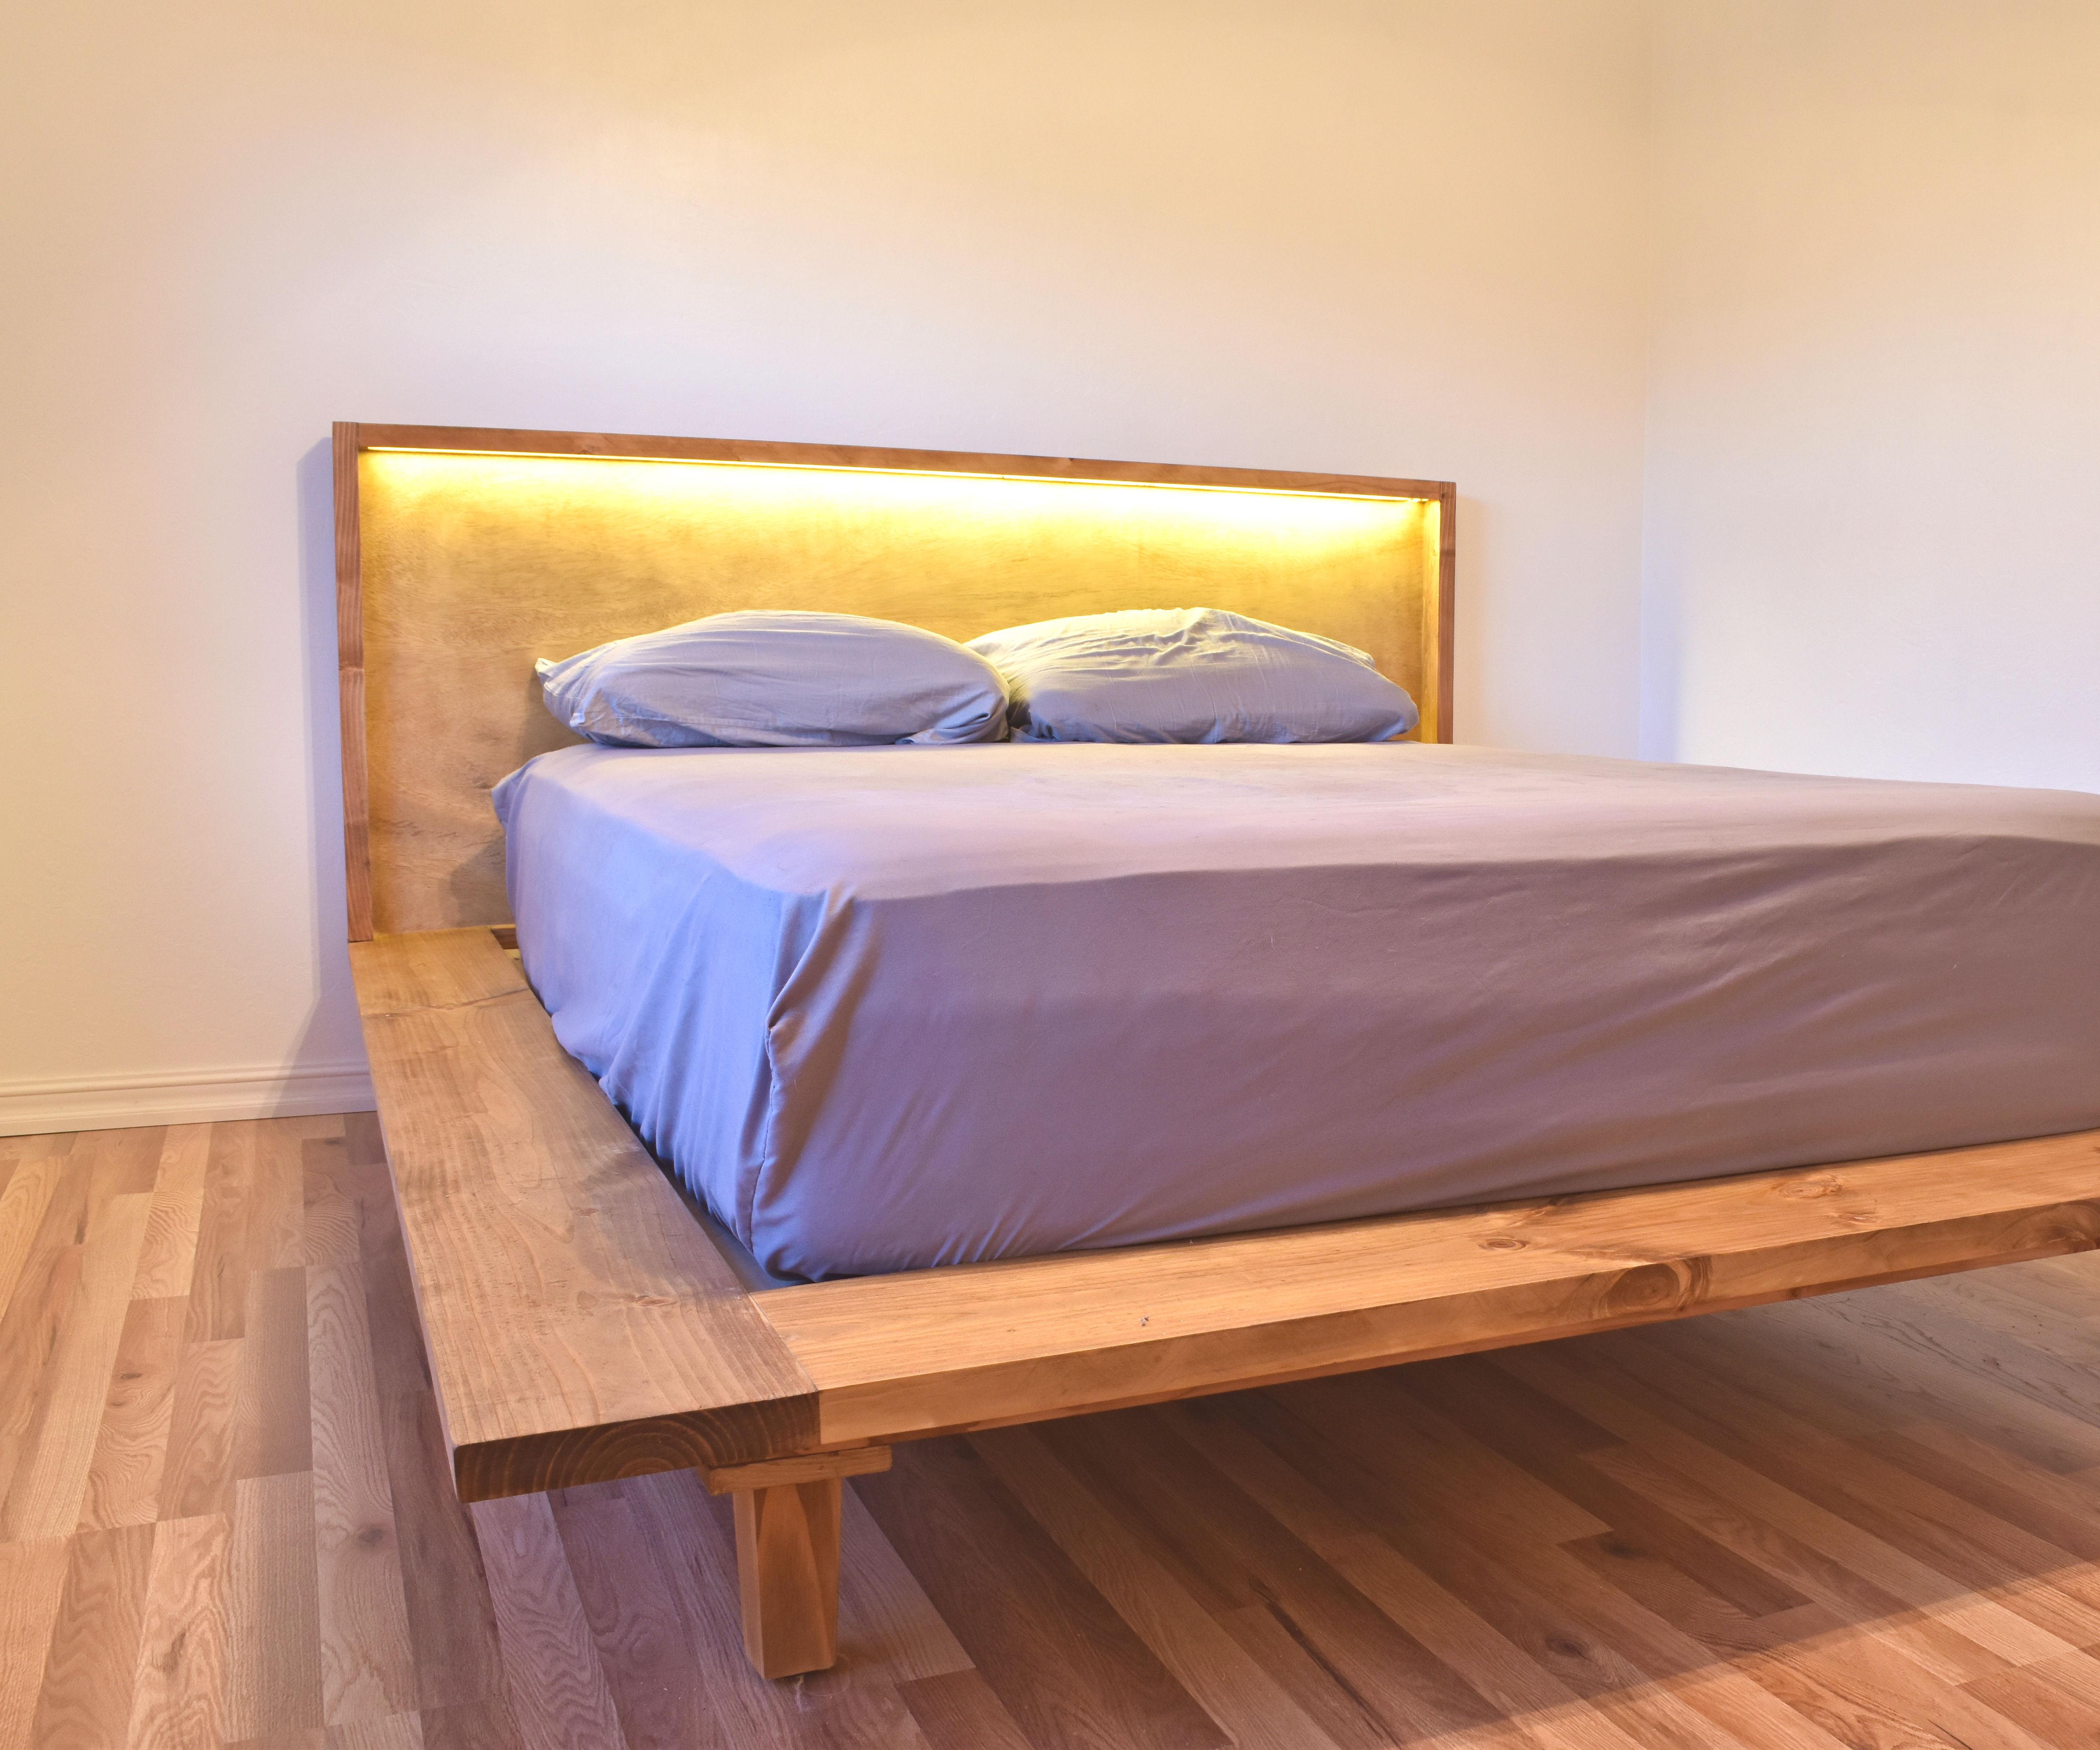 How to Build a Modern Platform Bed